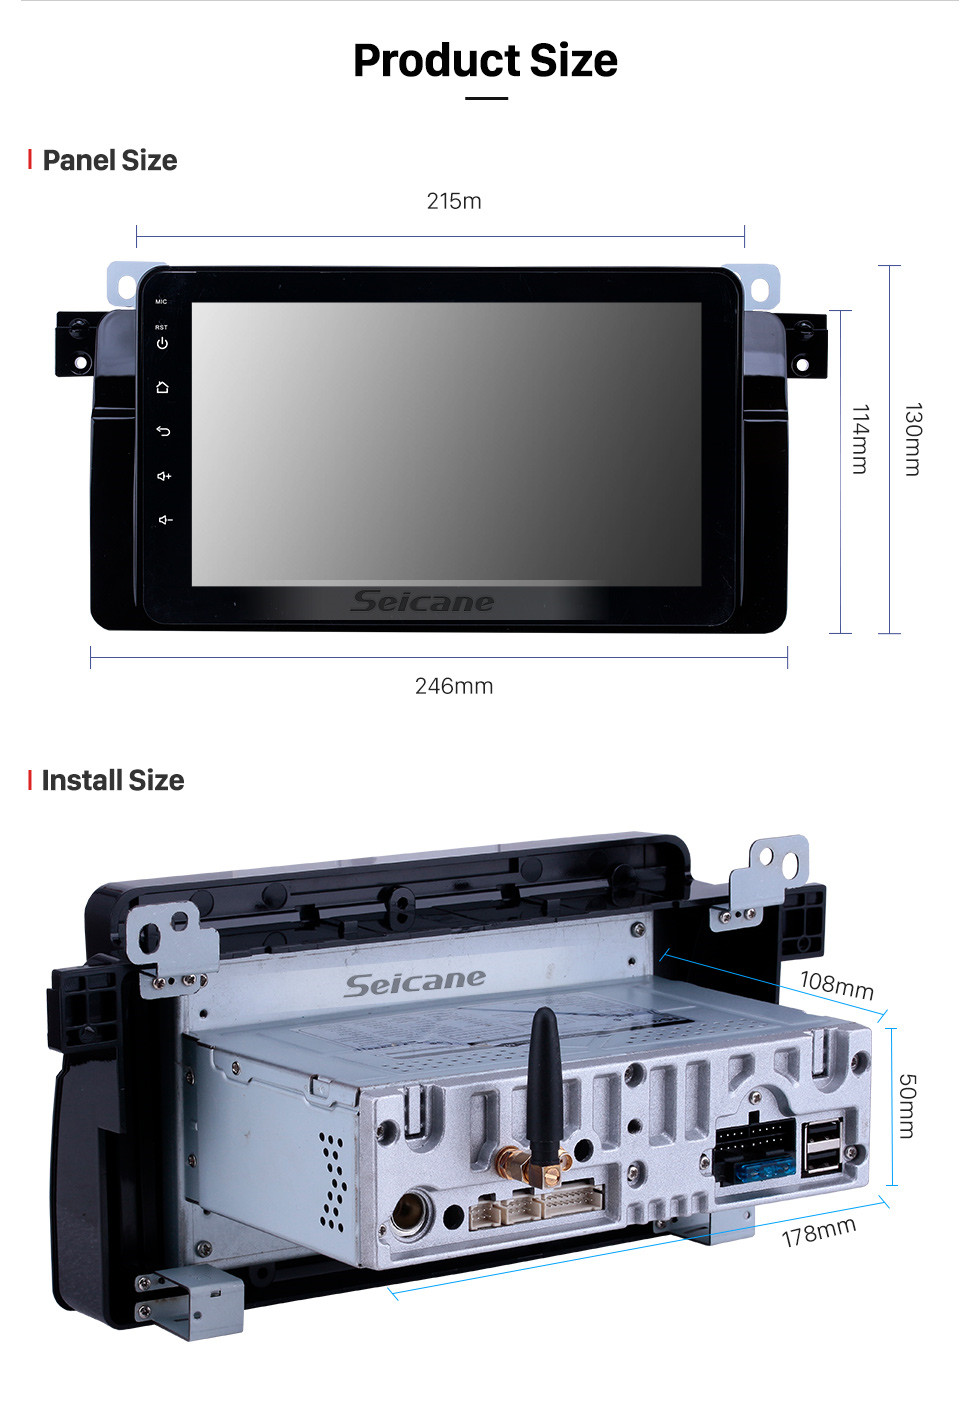 Seicane 8 дюймов 1998-2006 BMW 3 серии E46 M3 / 2001-2004 MG ZT / 1999-2004 Rover 75 Android 9.0 GPS-навигация Радио Bluetooth HD Сенсорный экран Поддержка Carplay Mirror Link